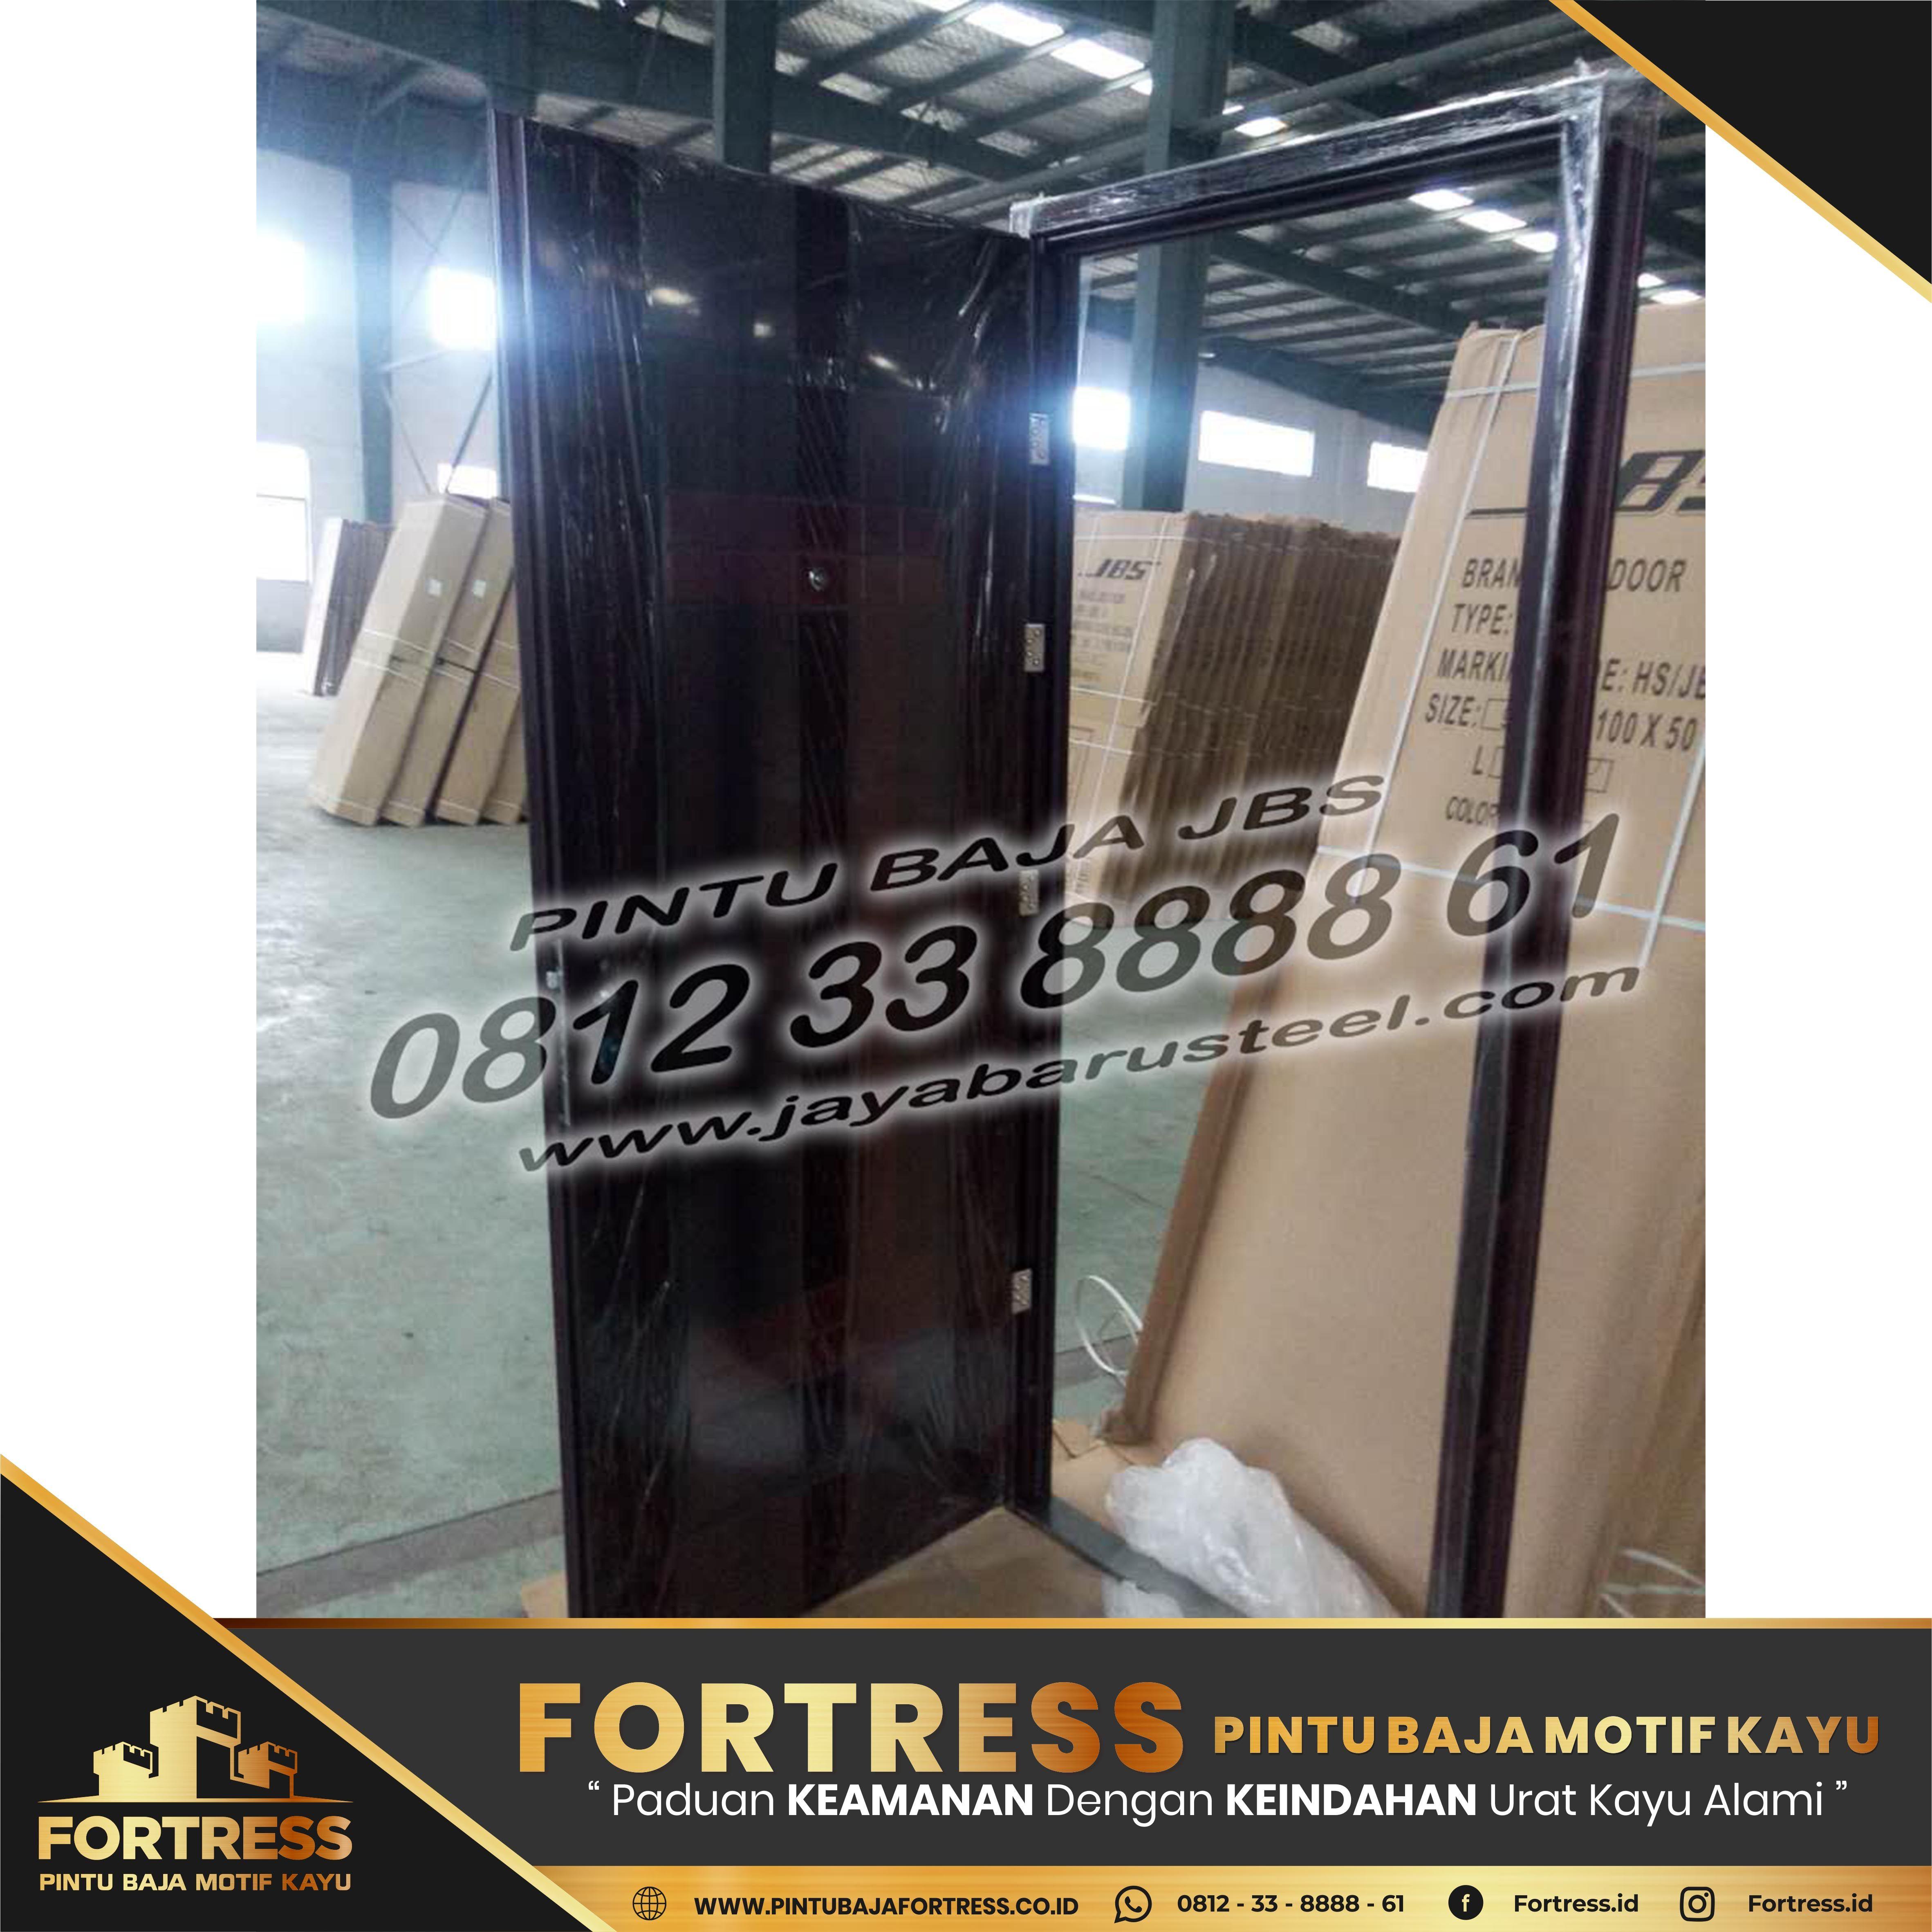 0812-91-6261-07 (JBS) The price of Steel Gauze Doors in Pekan Baru